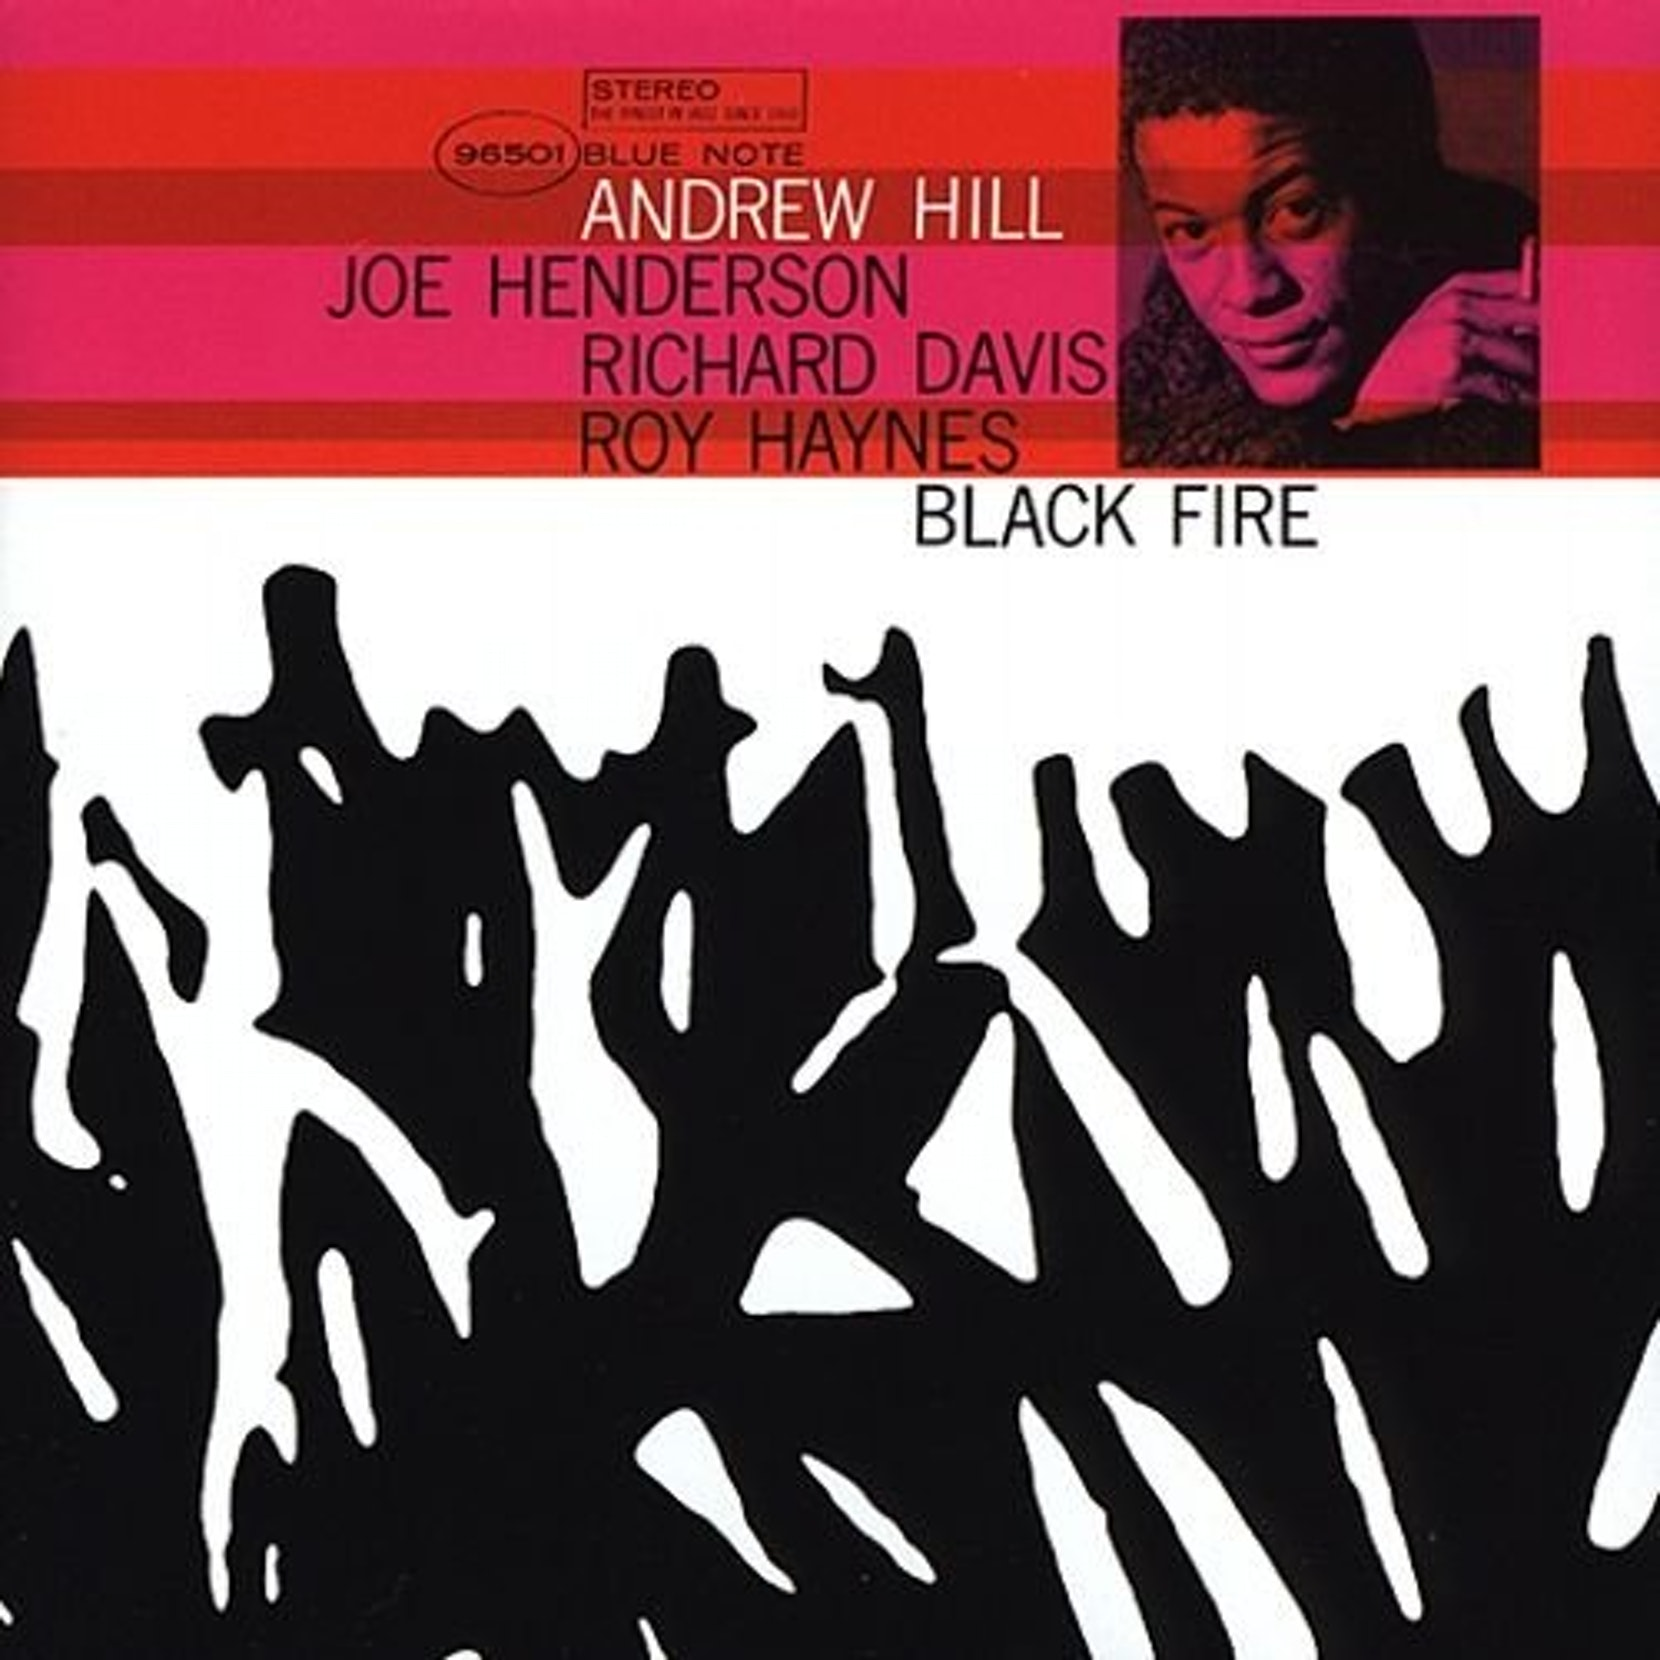 The 10 Best Jazz Albums For Continuing Your Jazz Studies — Vinyl Me